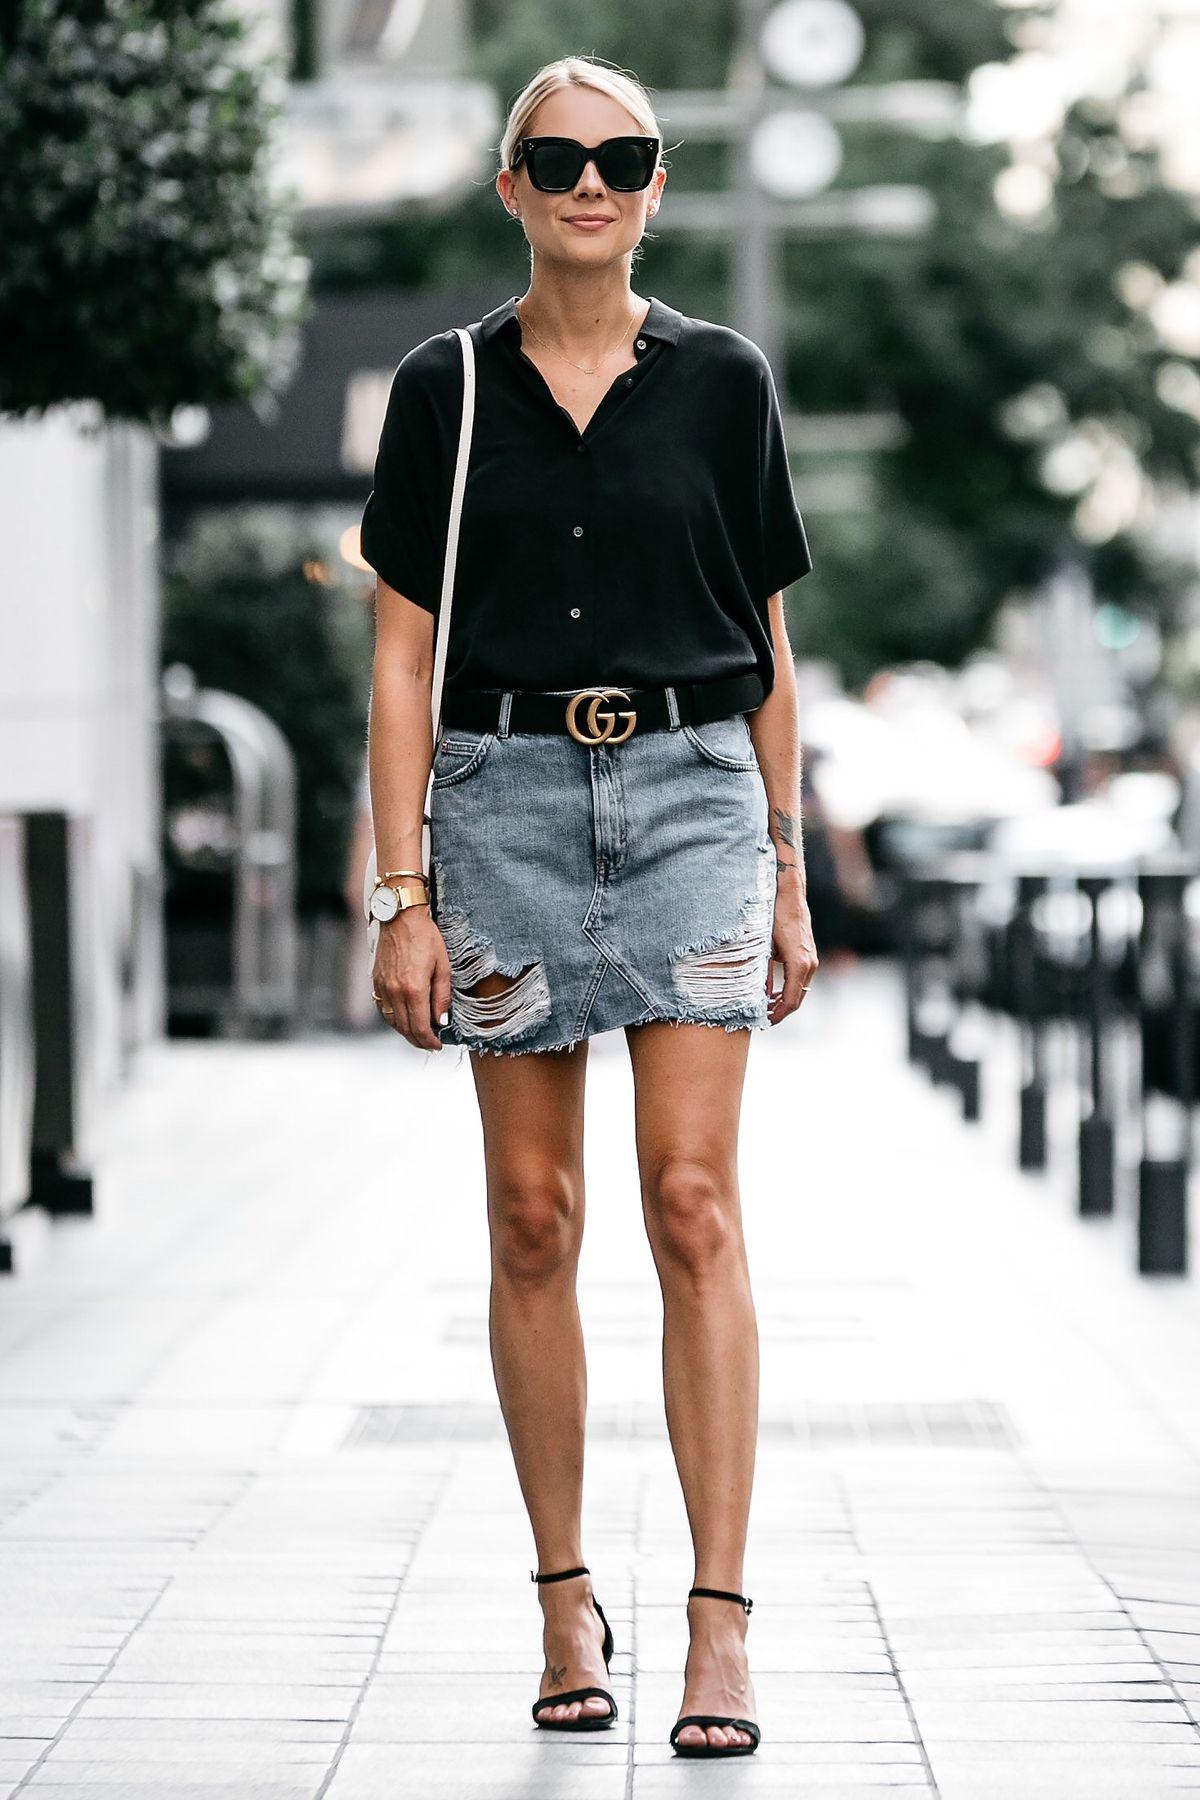 bb50b09f8c7 Blonde Woman Wearing Everlane Black Short Sleeve Shirt Topshop Ripped Denim  Skirt Outfit Gucci Marmont Belt Celine Trotteur White Handbag Black Ankle  Strap ...